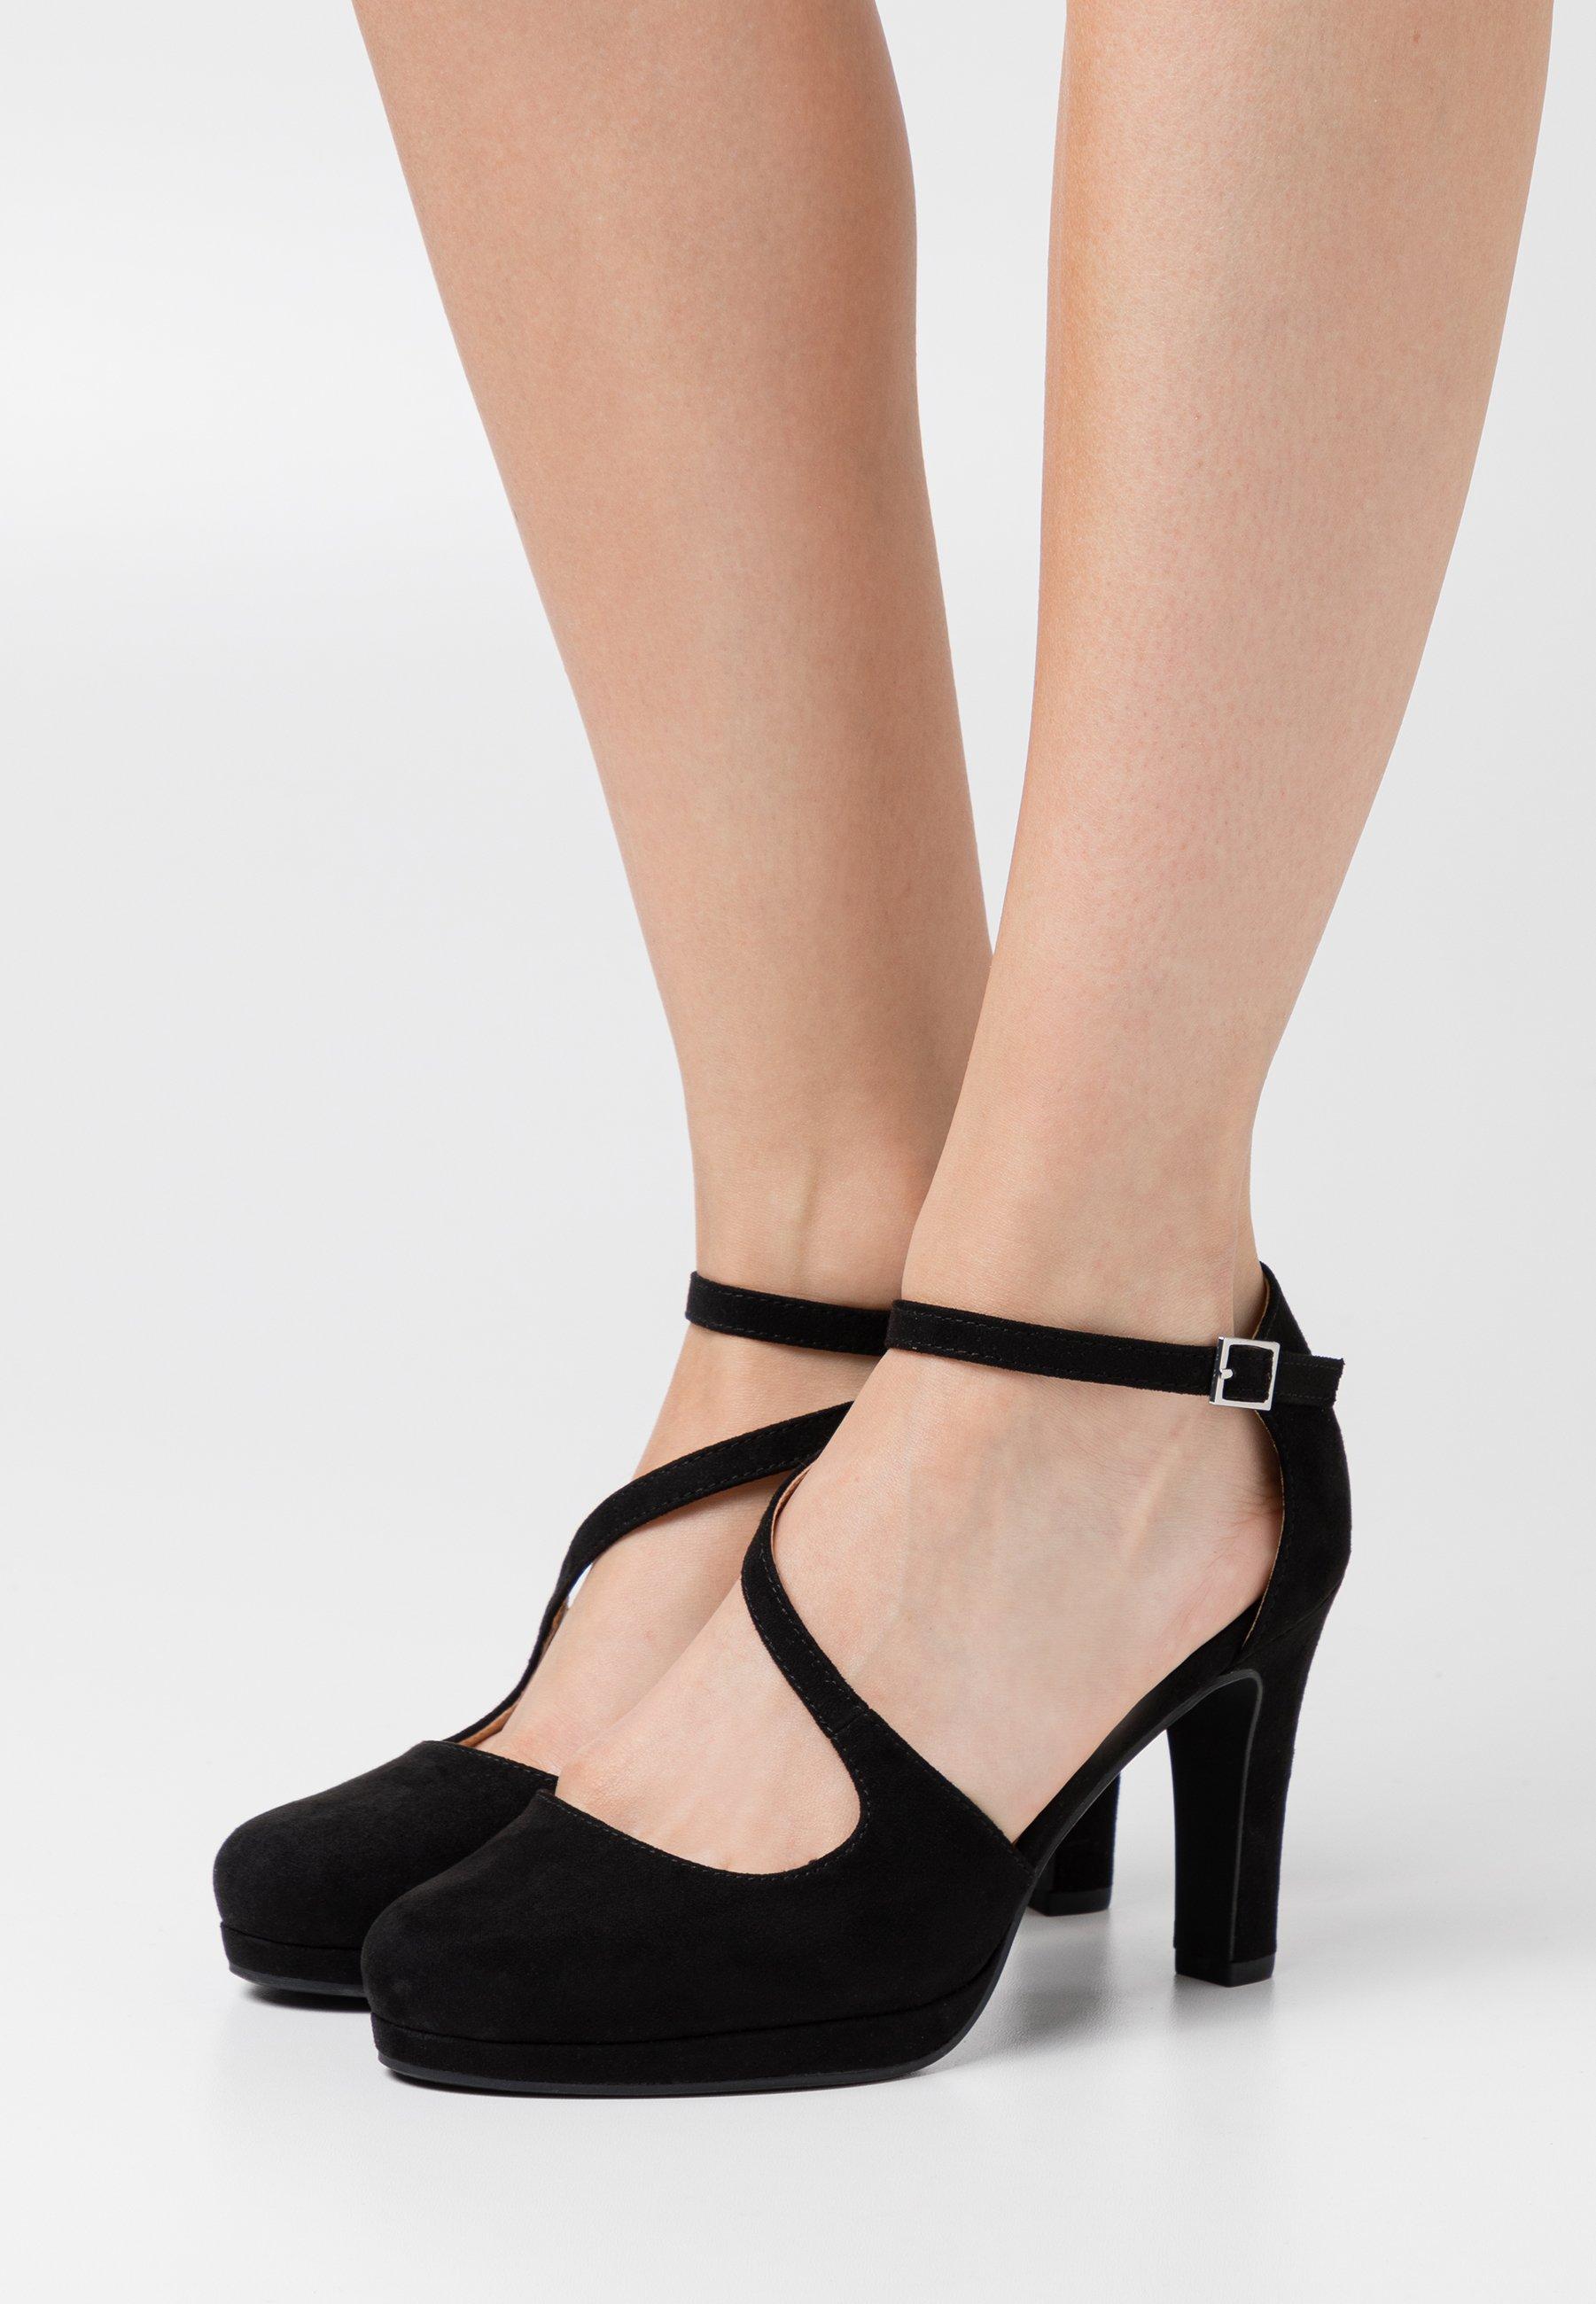 Damen High Heel Pumps - black